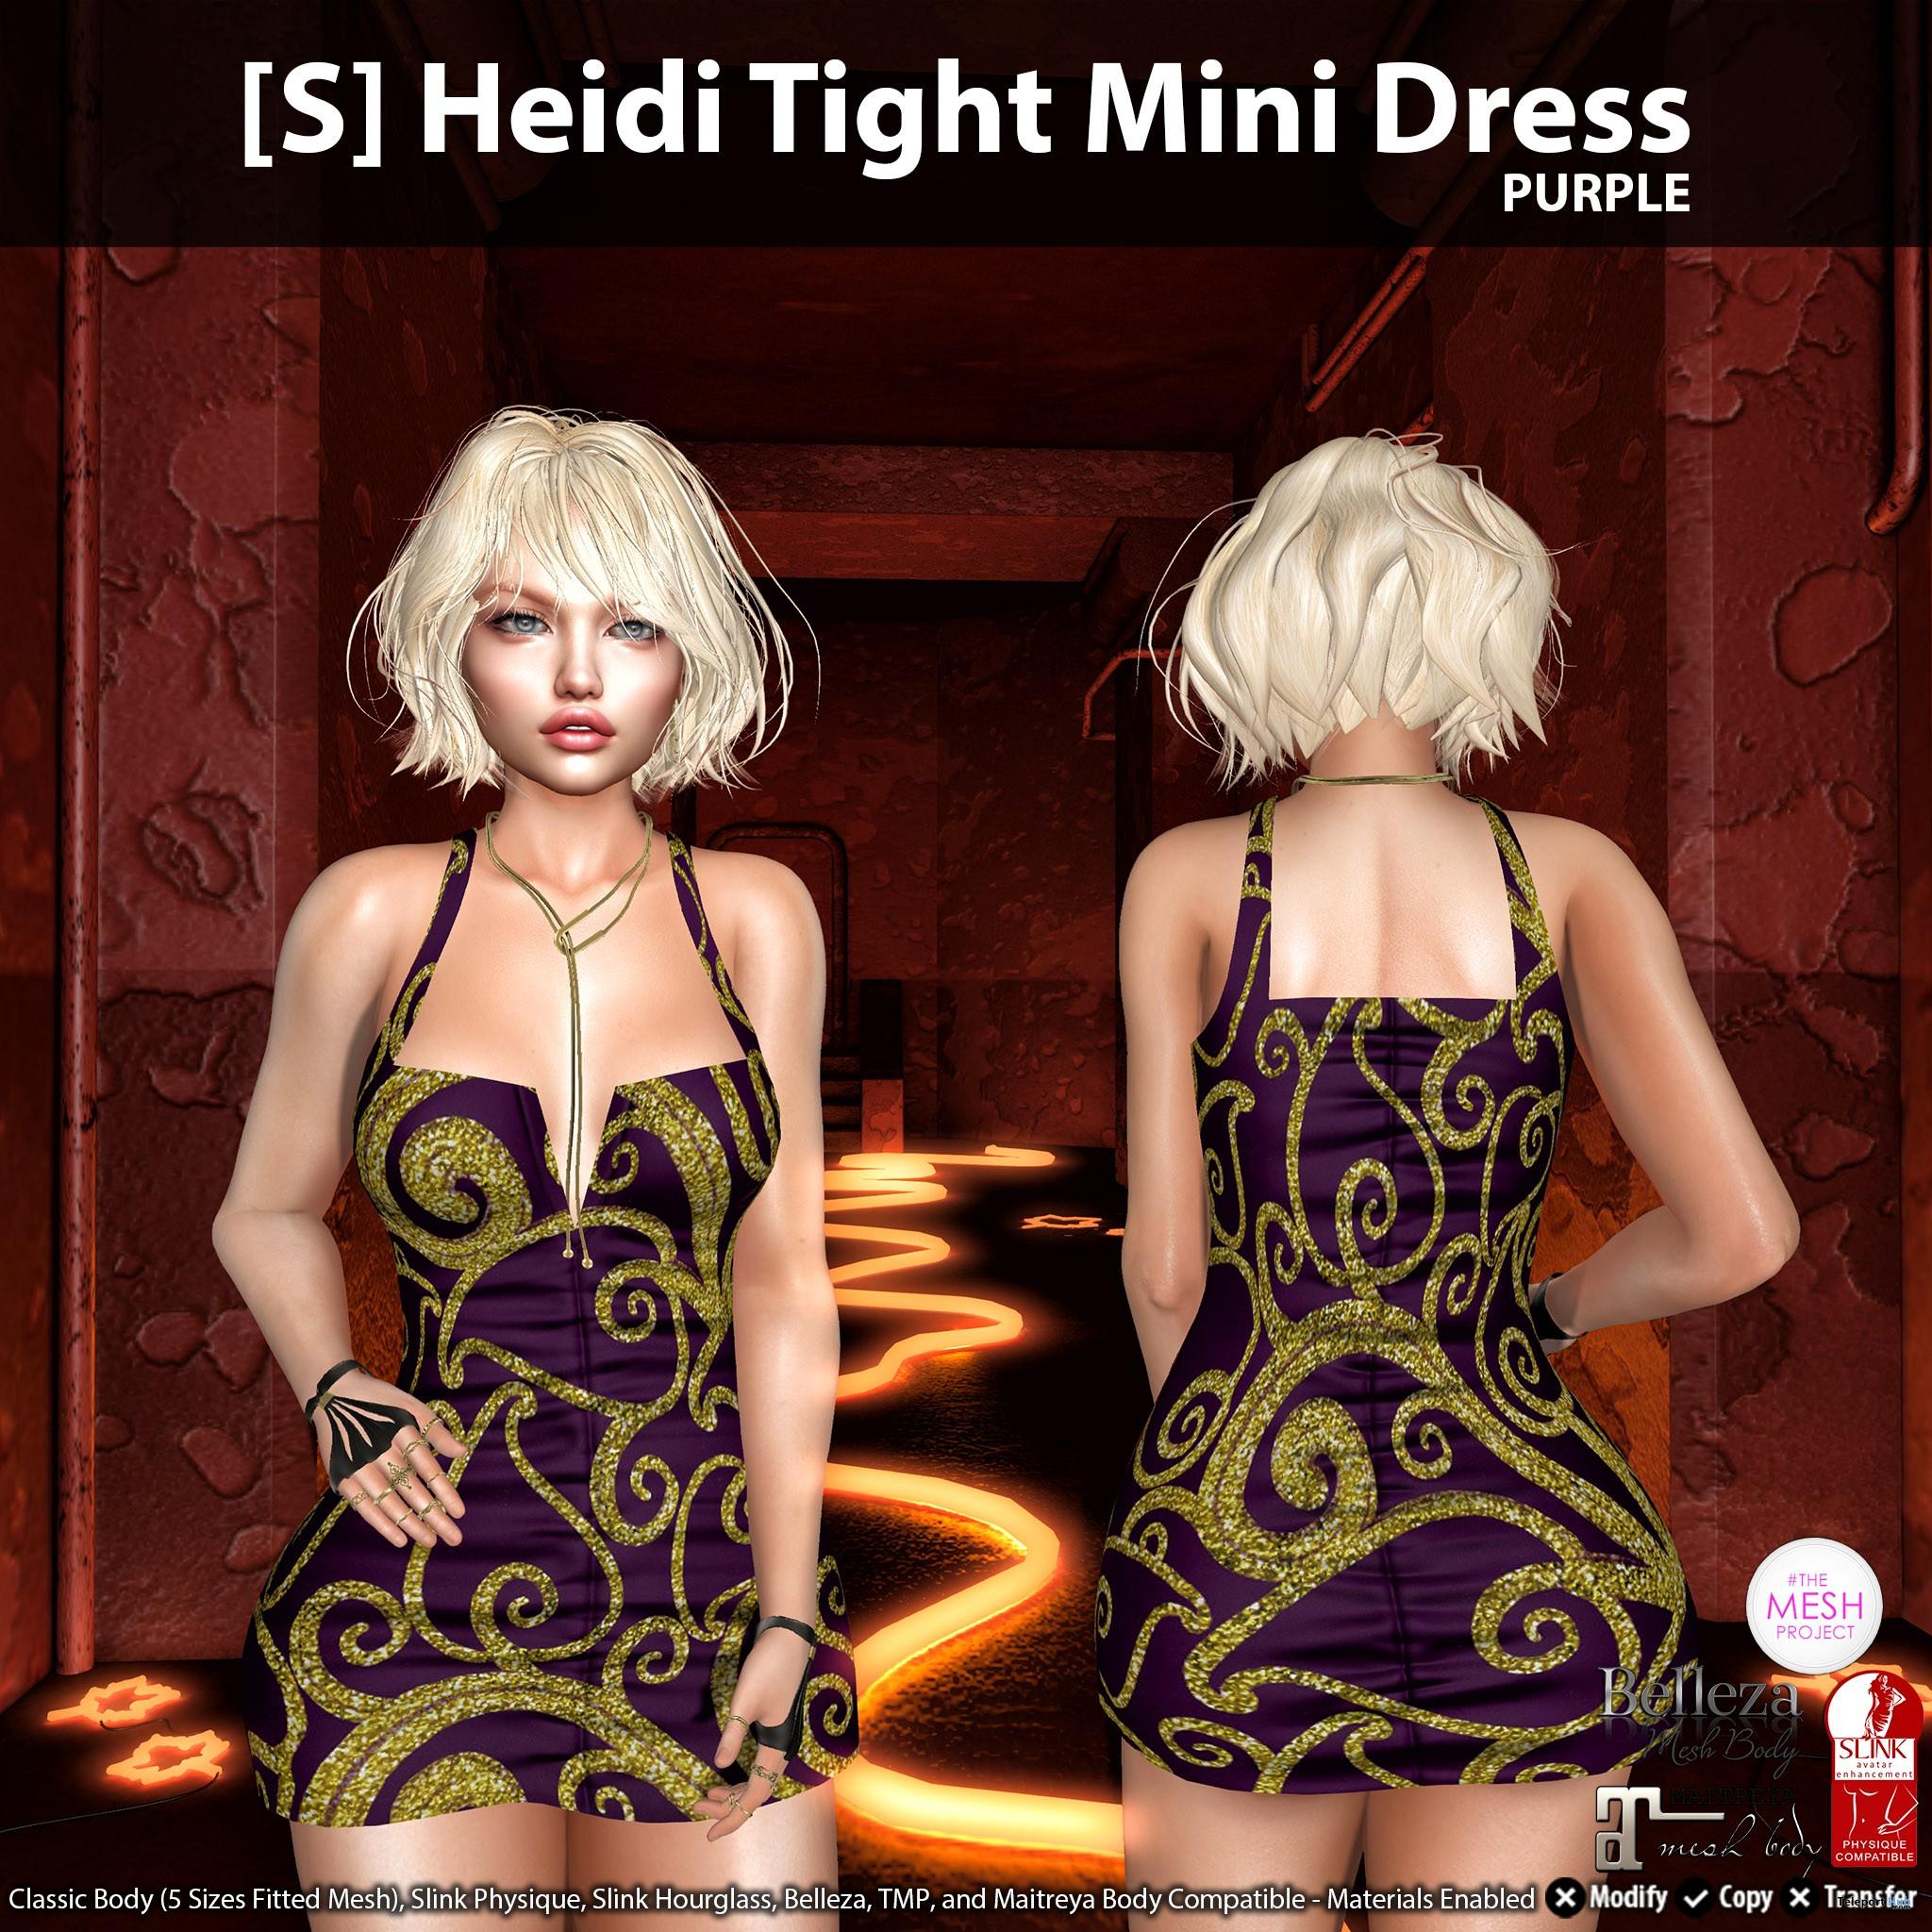 New Release: [S] Heidi Tight Mini Dress by [satus Inc] - Teleport Hub - teleporthub.com